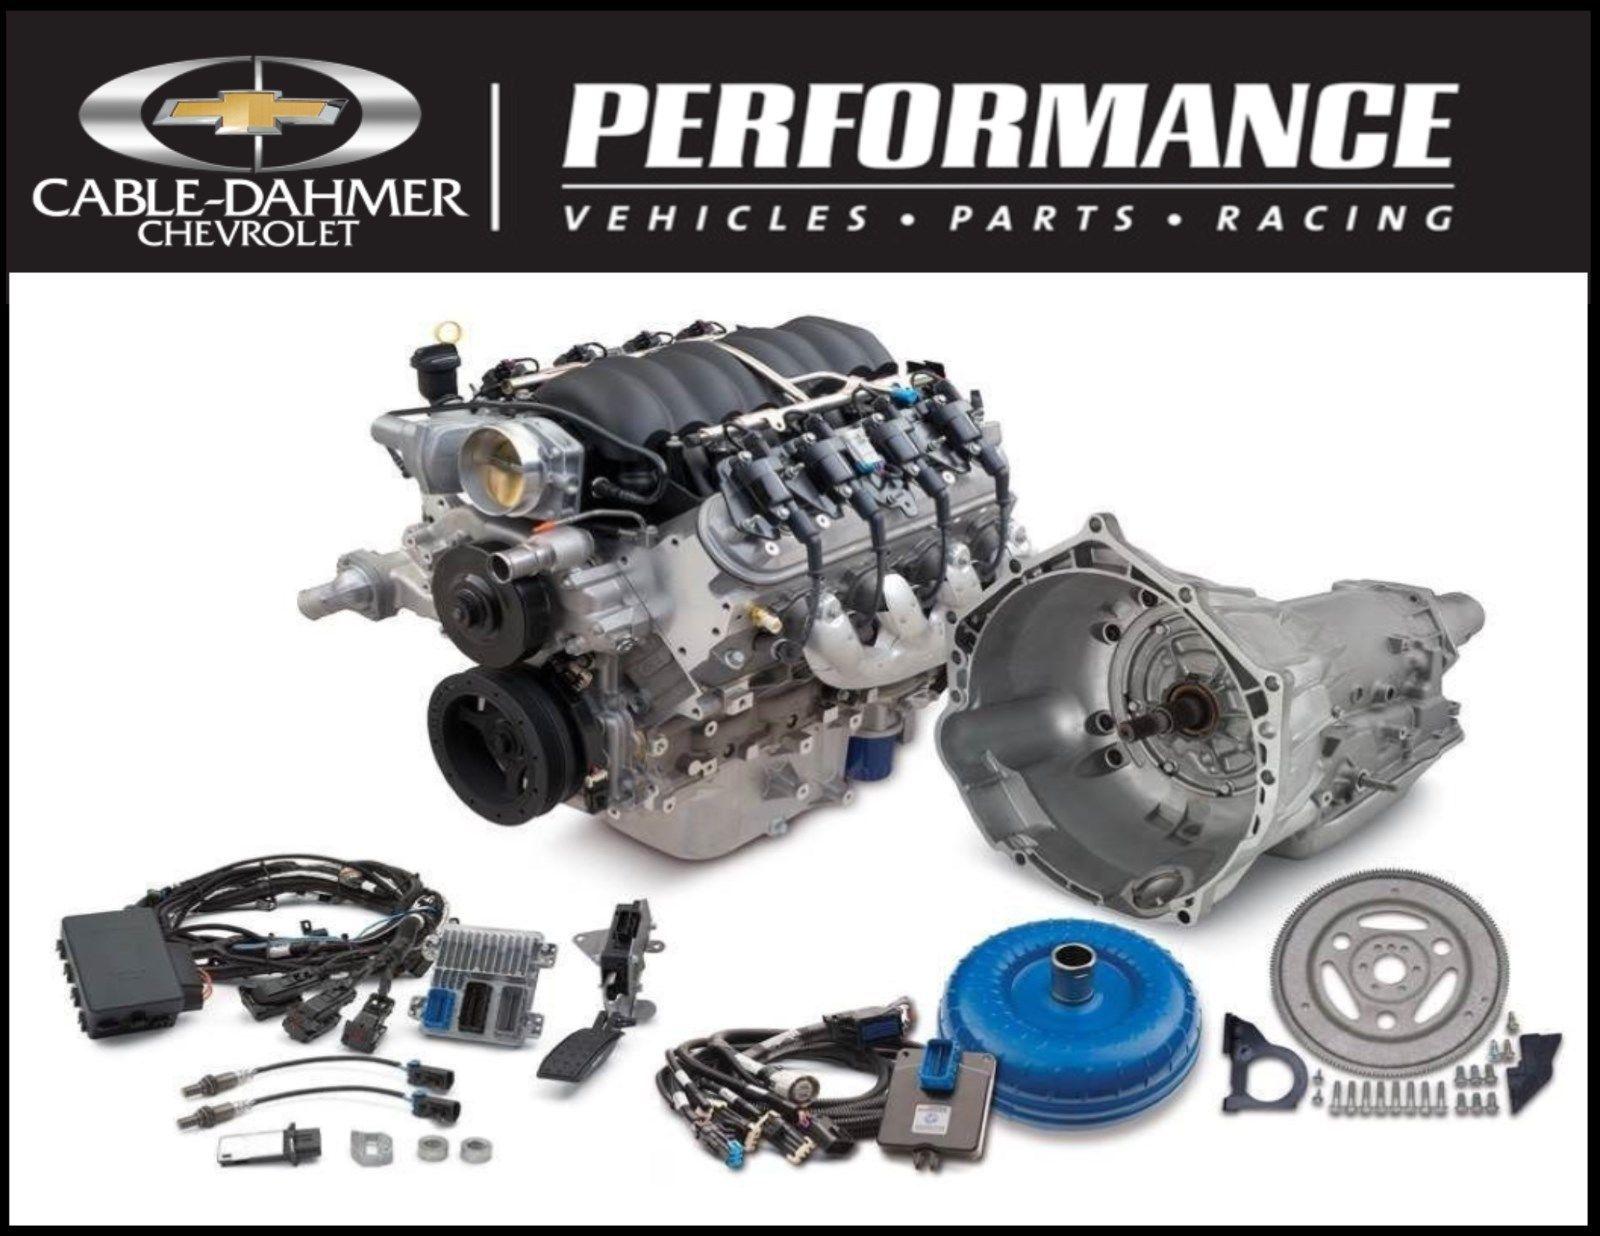 Chevrolet Oem Parts | Car | Pinterest | Performance engines ...